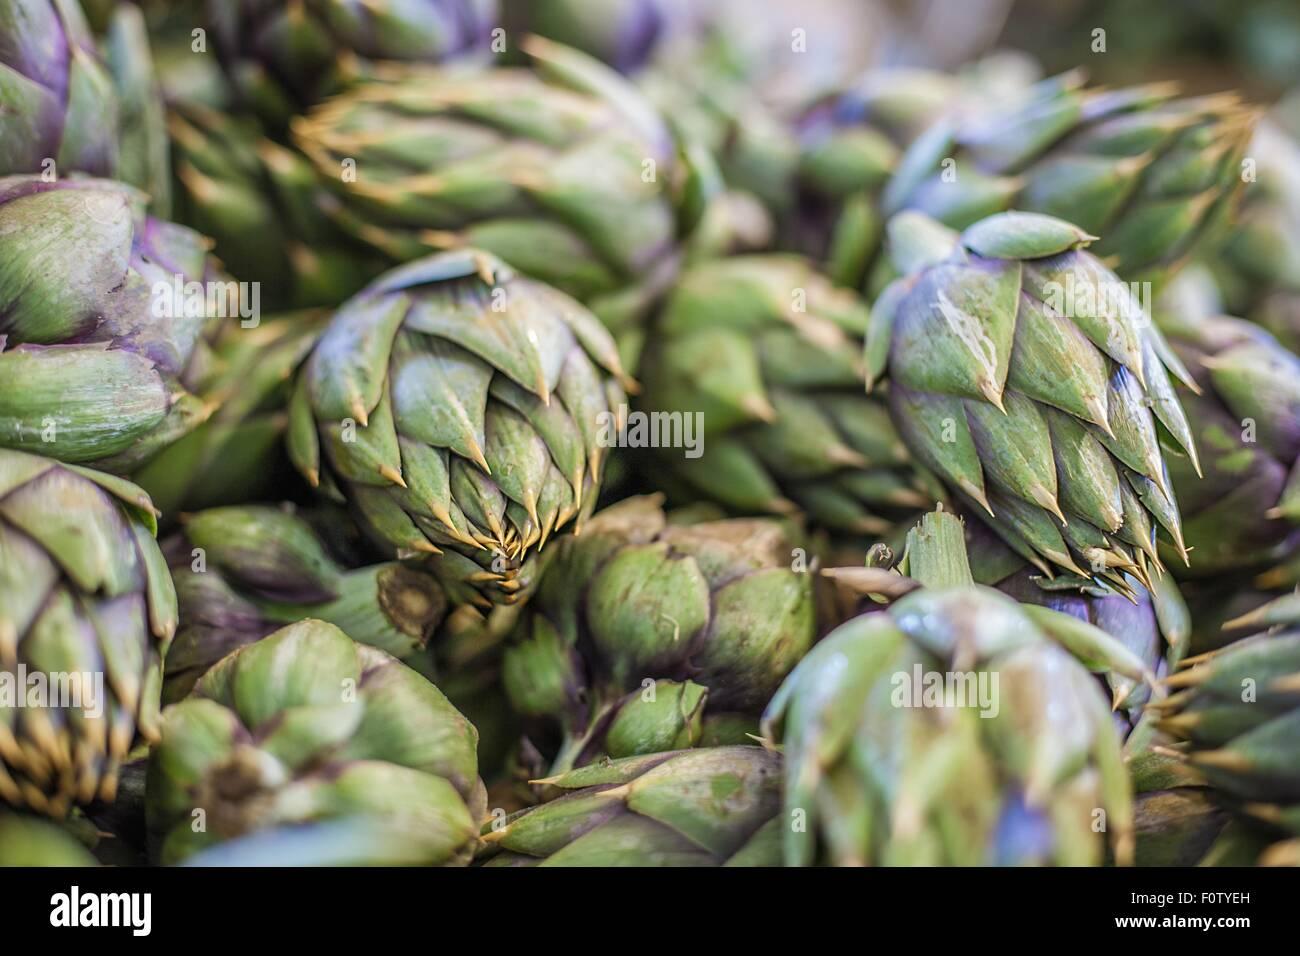 Pila di carciofi, full frame, close-up Immagini Stock